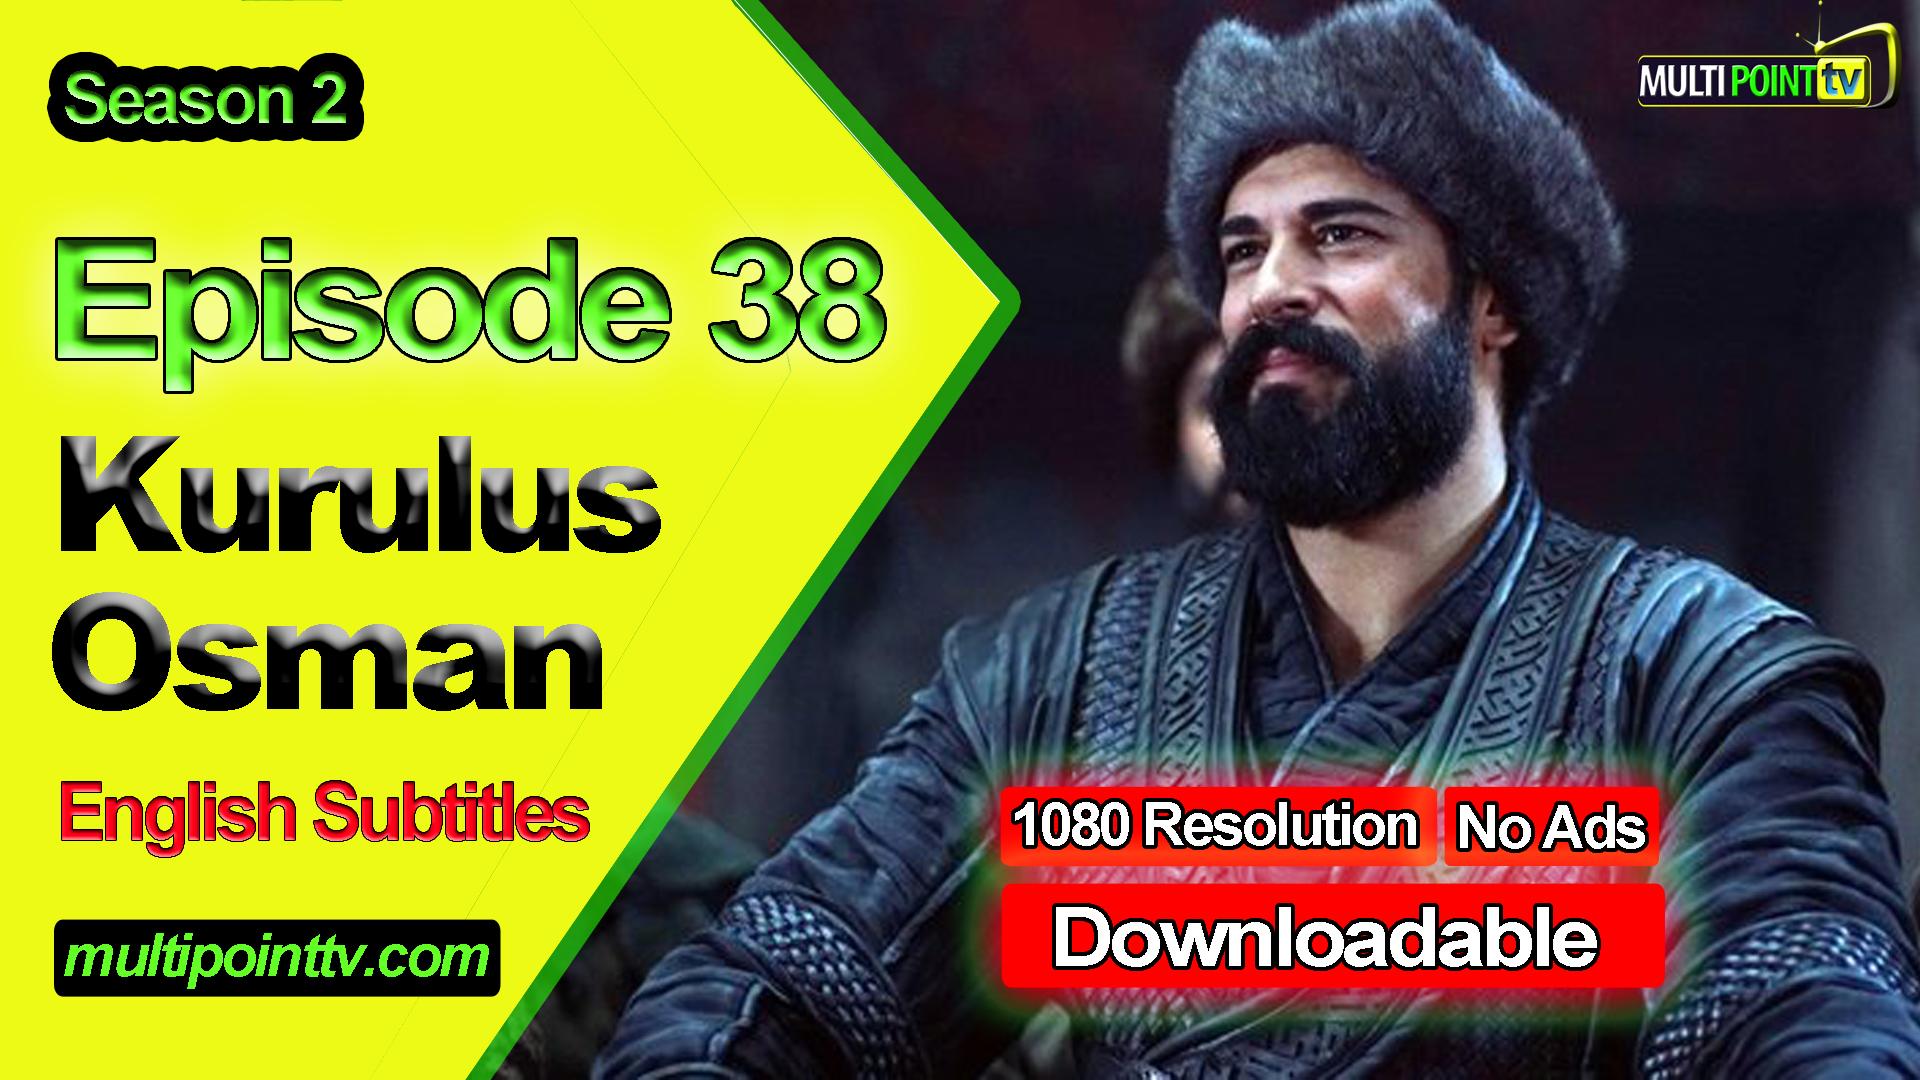 Kurulus Osman Episode 38 English Subtitles